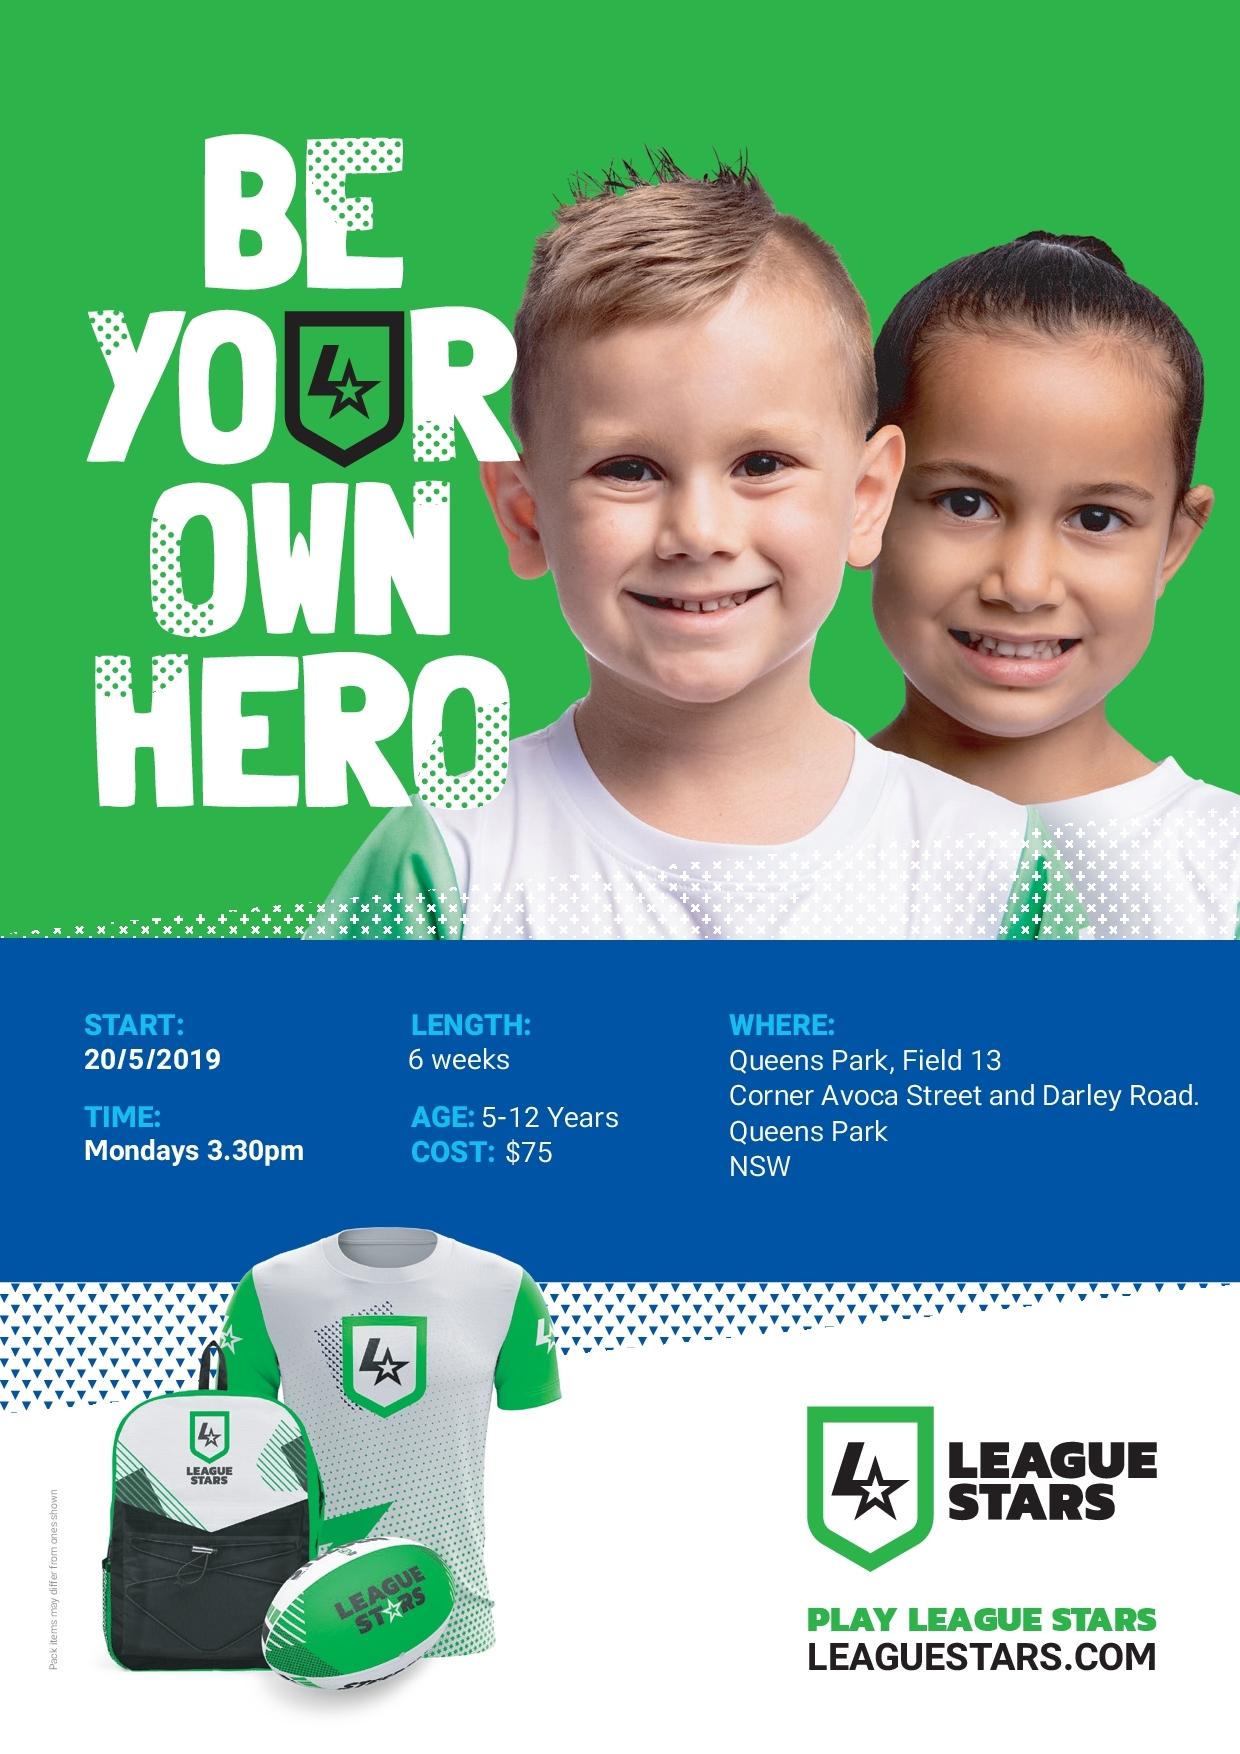 League Stars 20 May 2019 Queens Park 13.jpg